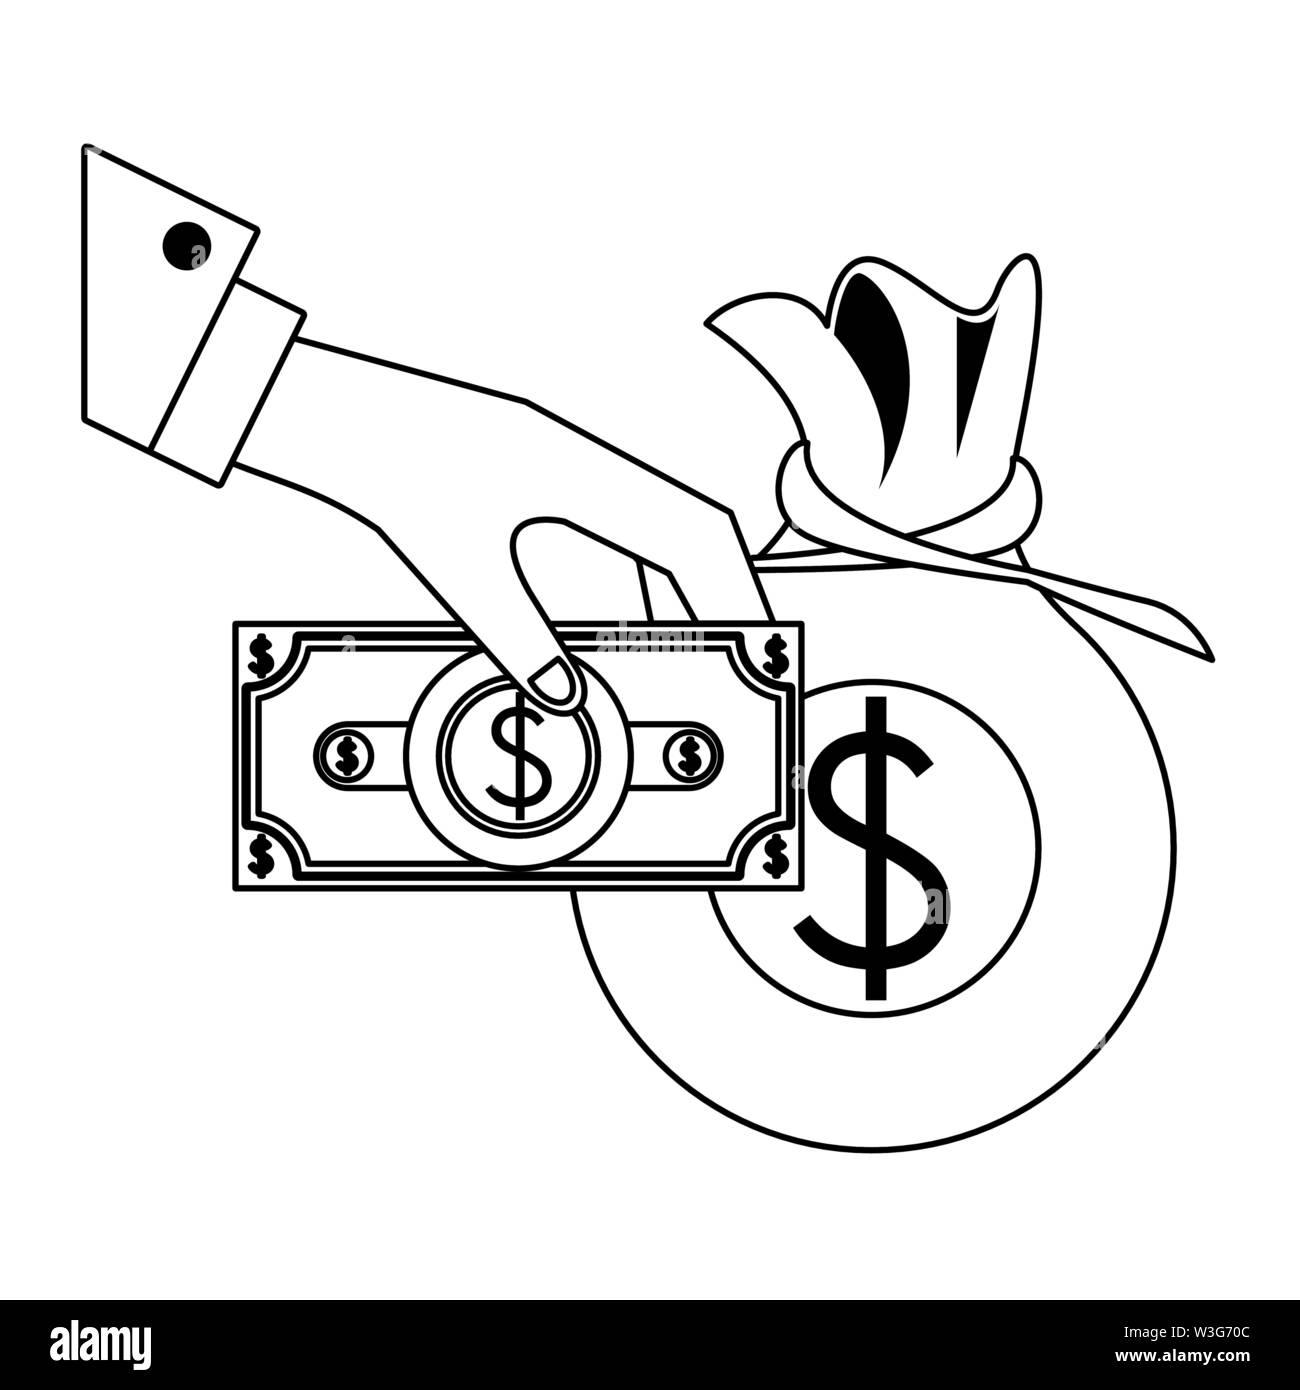 Geld sparen Business Finance banking Konzept Elemente cartoon Vector Illustration graphic design Stockbild